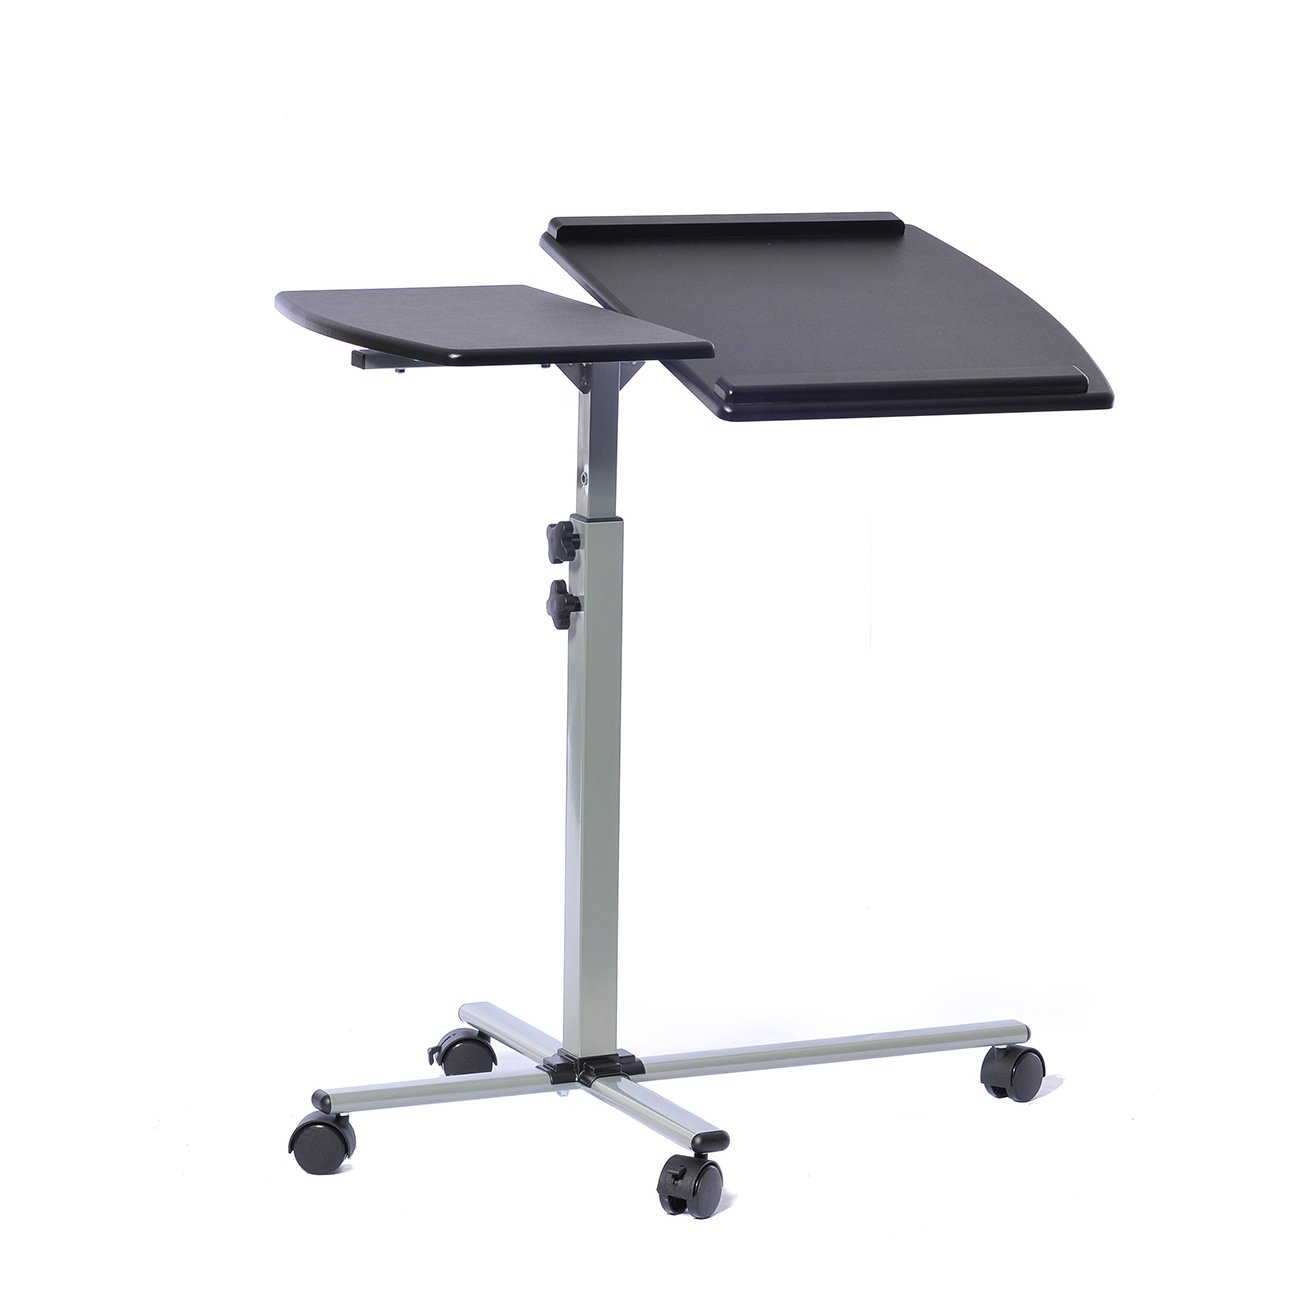 Techni Mobili Height Adjustable Laptop Cart, Graphite